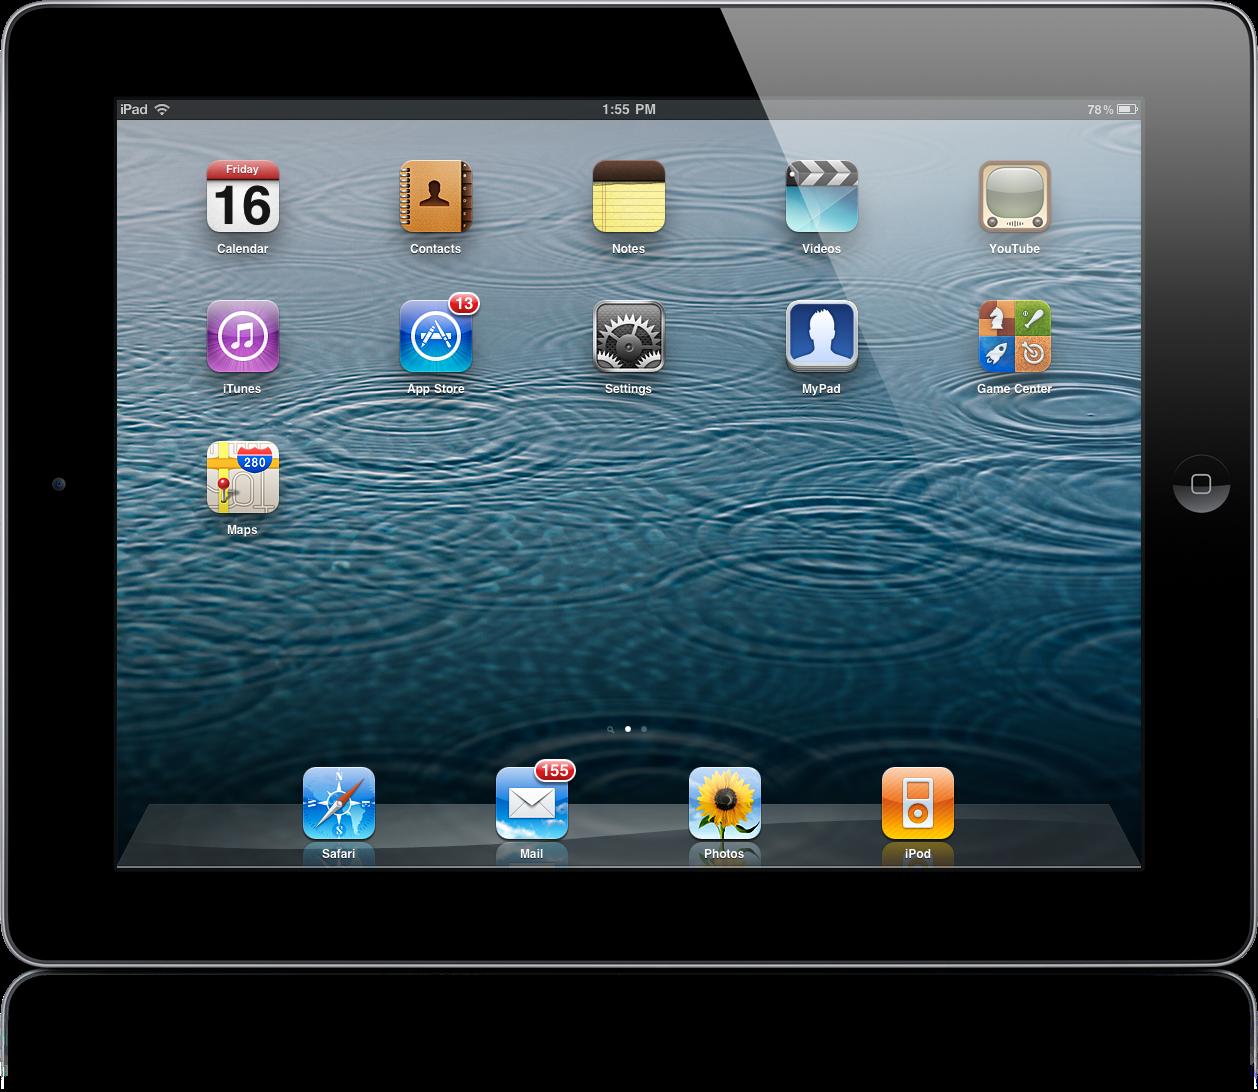 iPad com wallpaper do iOS 5.1